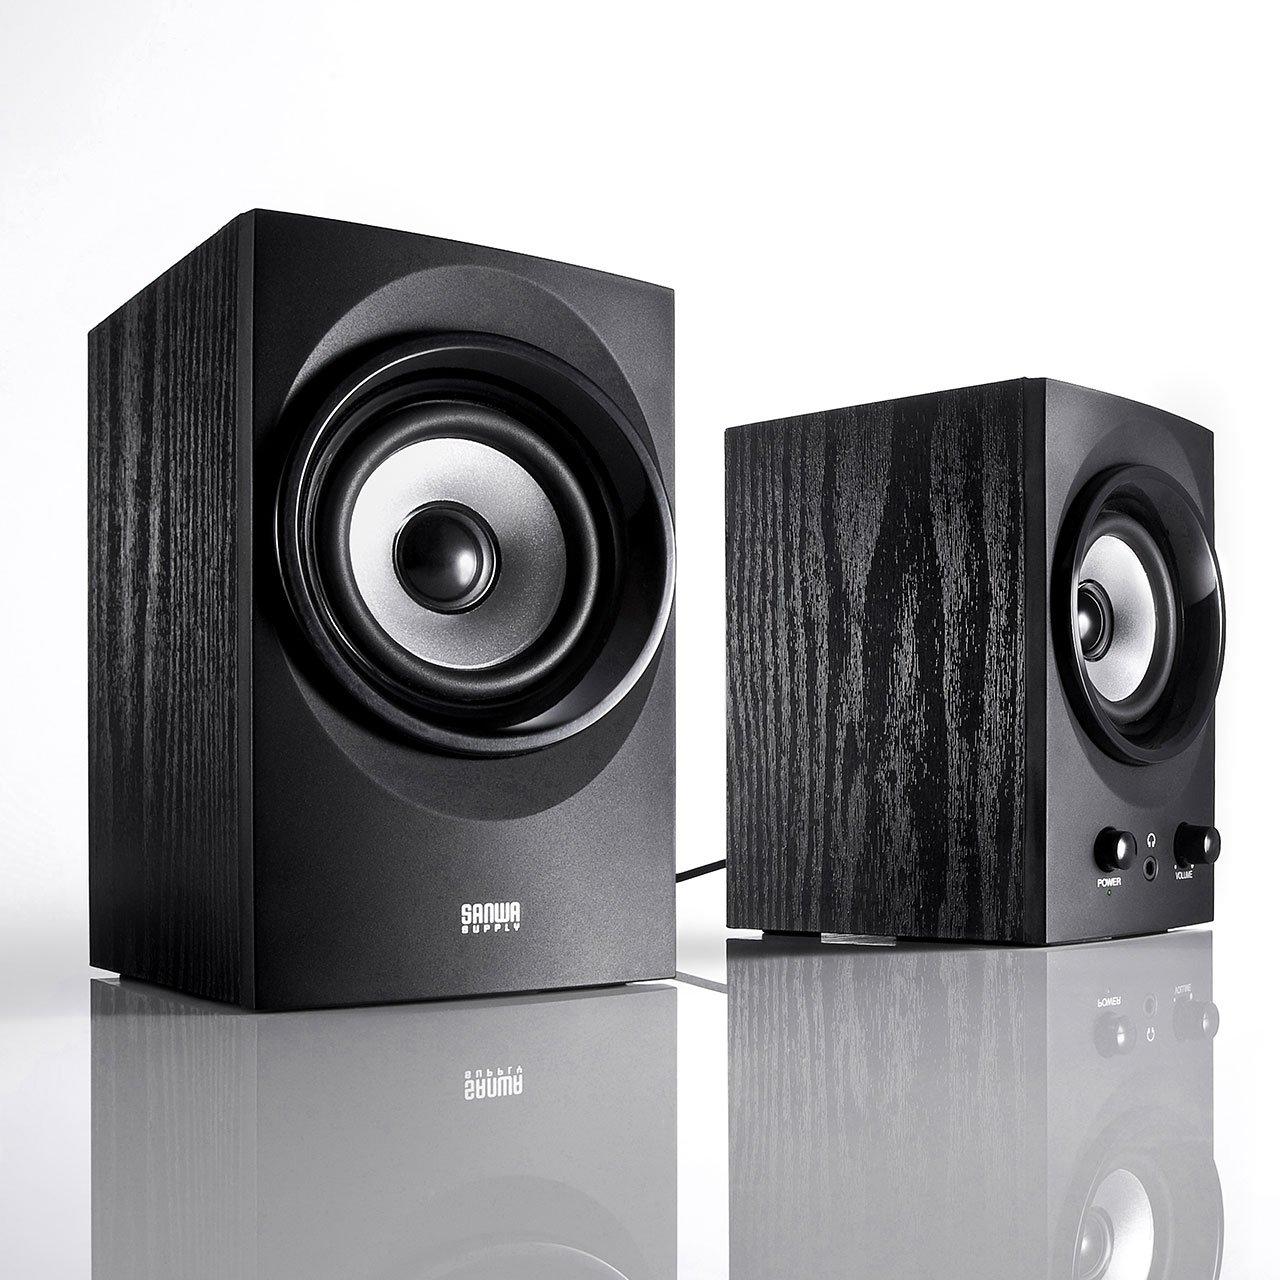 SANWA SUPPLY high-power USB speaker MM-SPU9BK (Black) by Sanwa (Image #3)